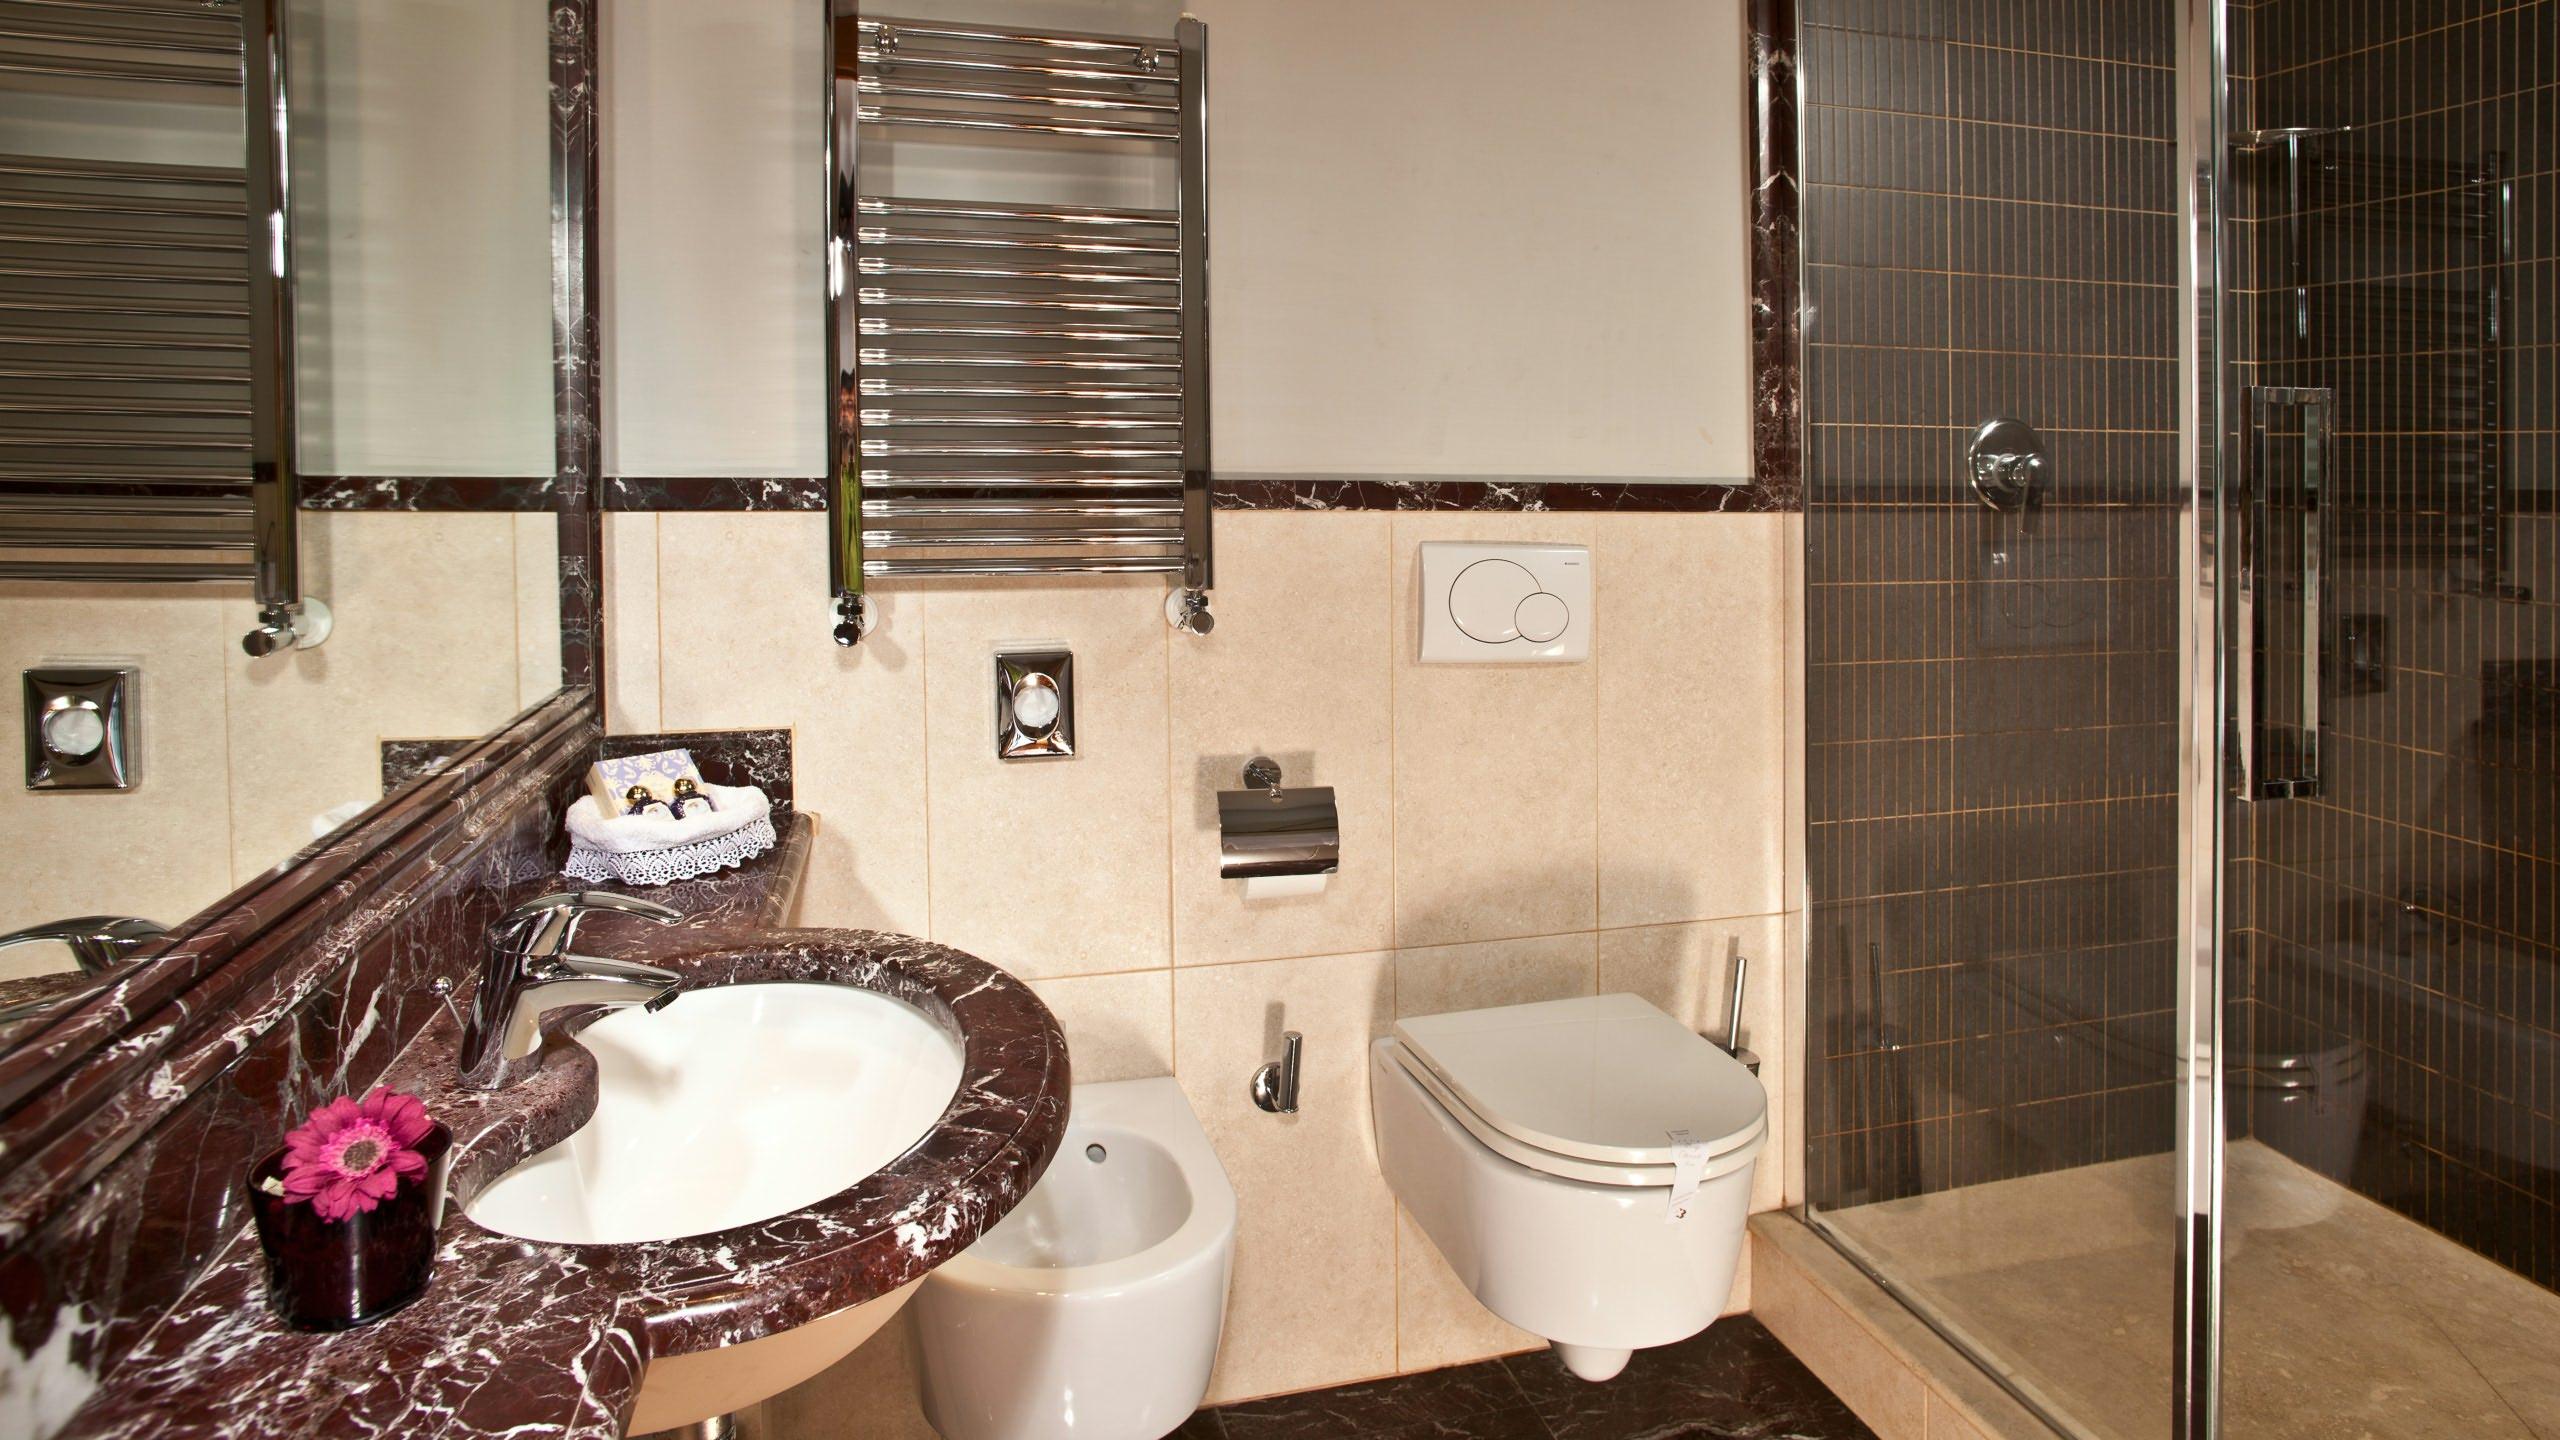 albergo-ottocento-rome-bathroom-21